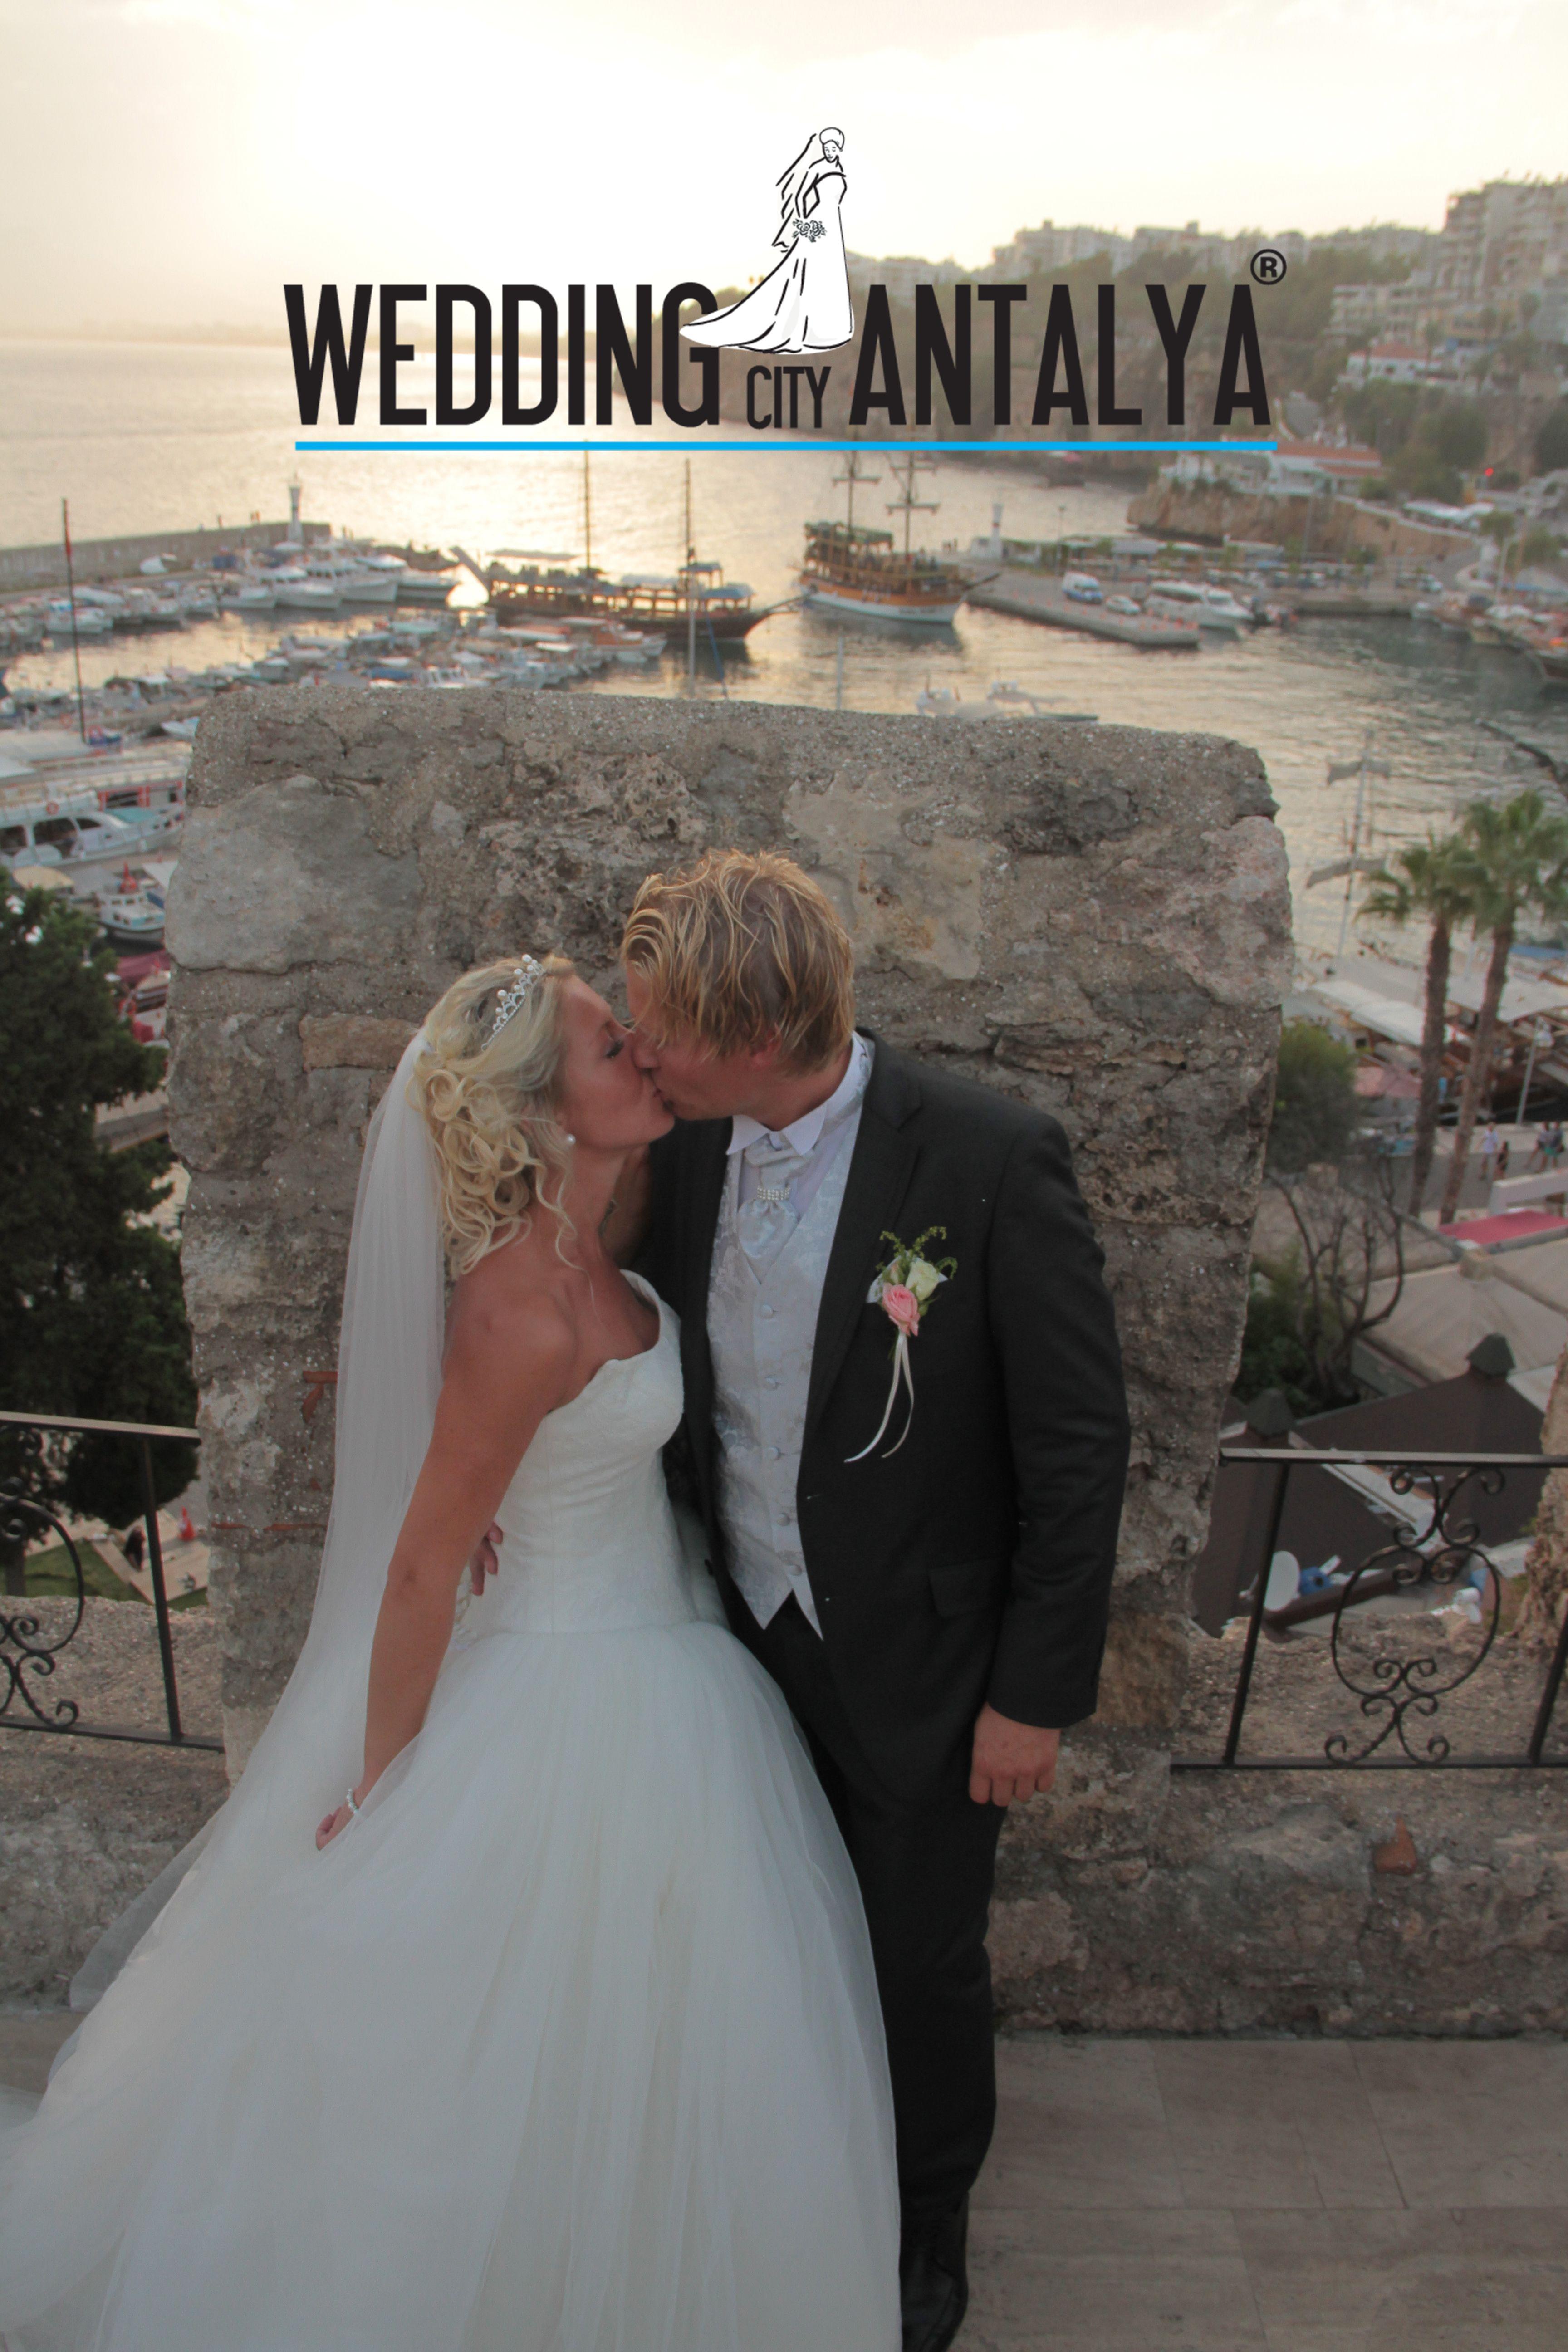 Marriage services in turkey civil marriage in turkey in